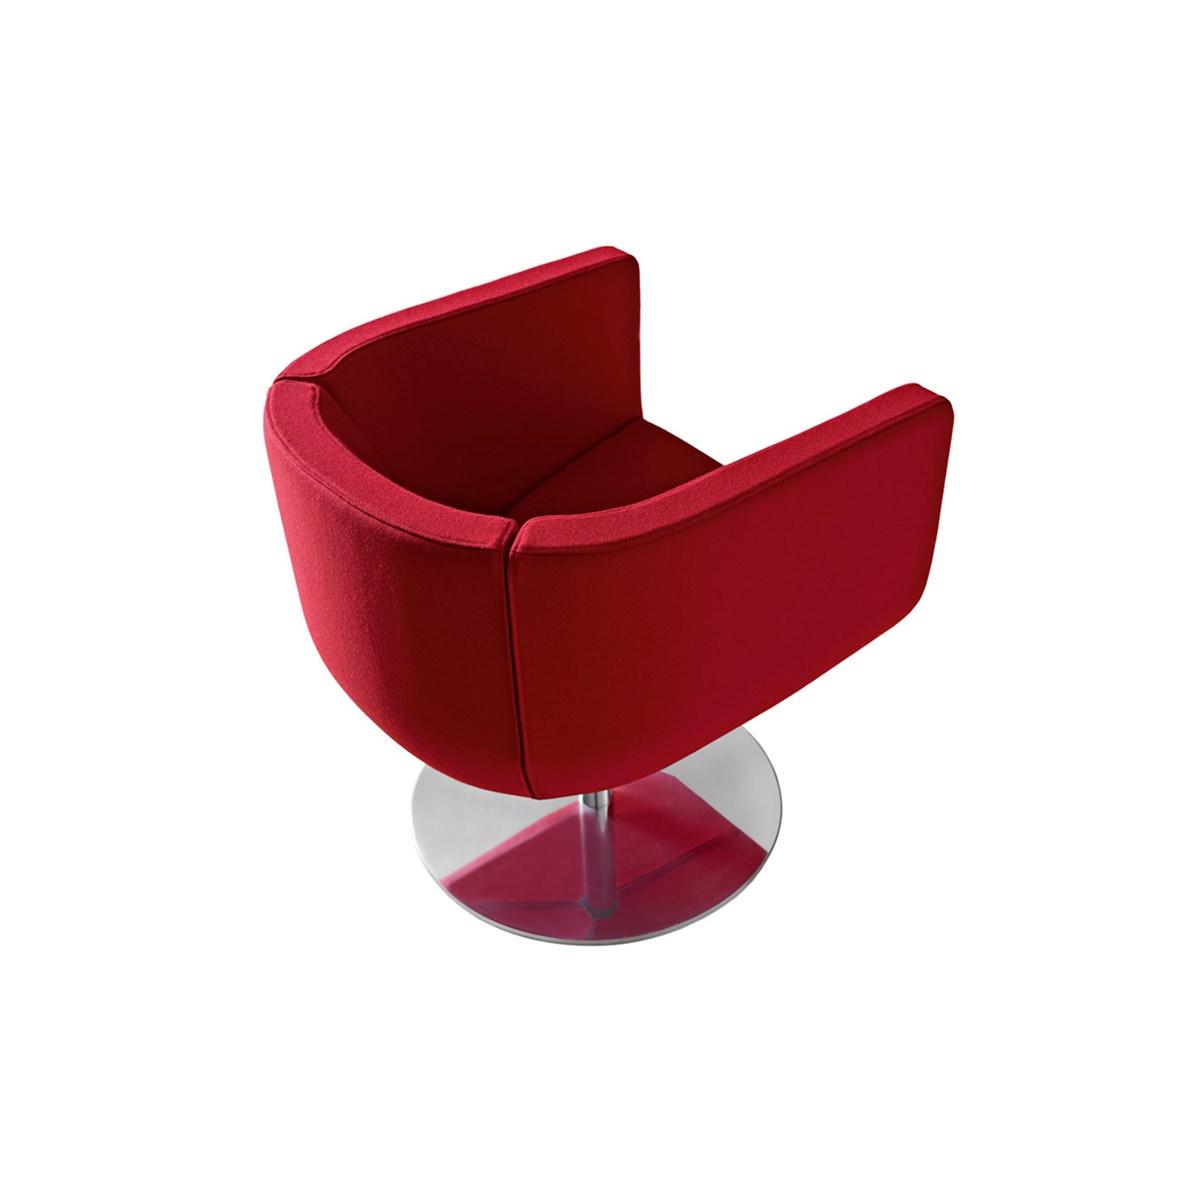 B&B-Italia-Jeffrey-Bernett-Tulip-Sixtysix-Armchair-Matisse-3